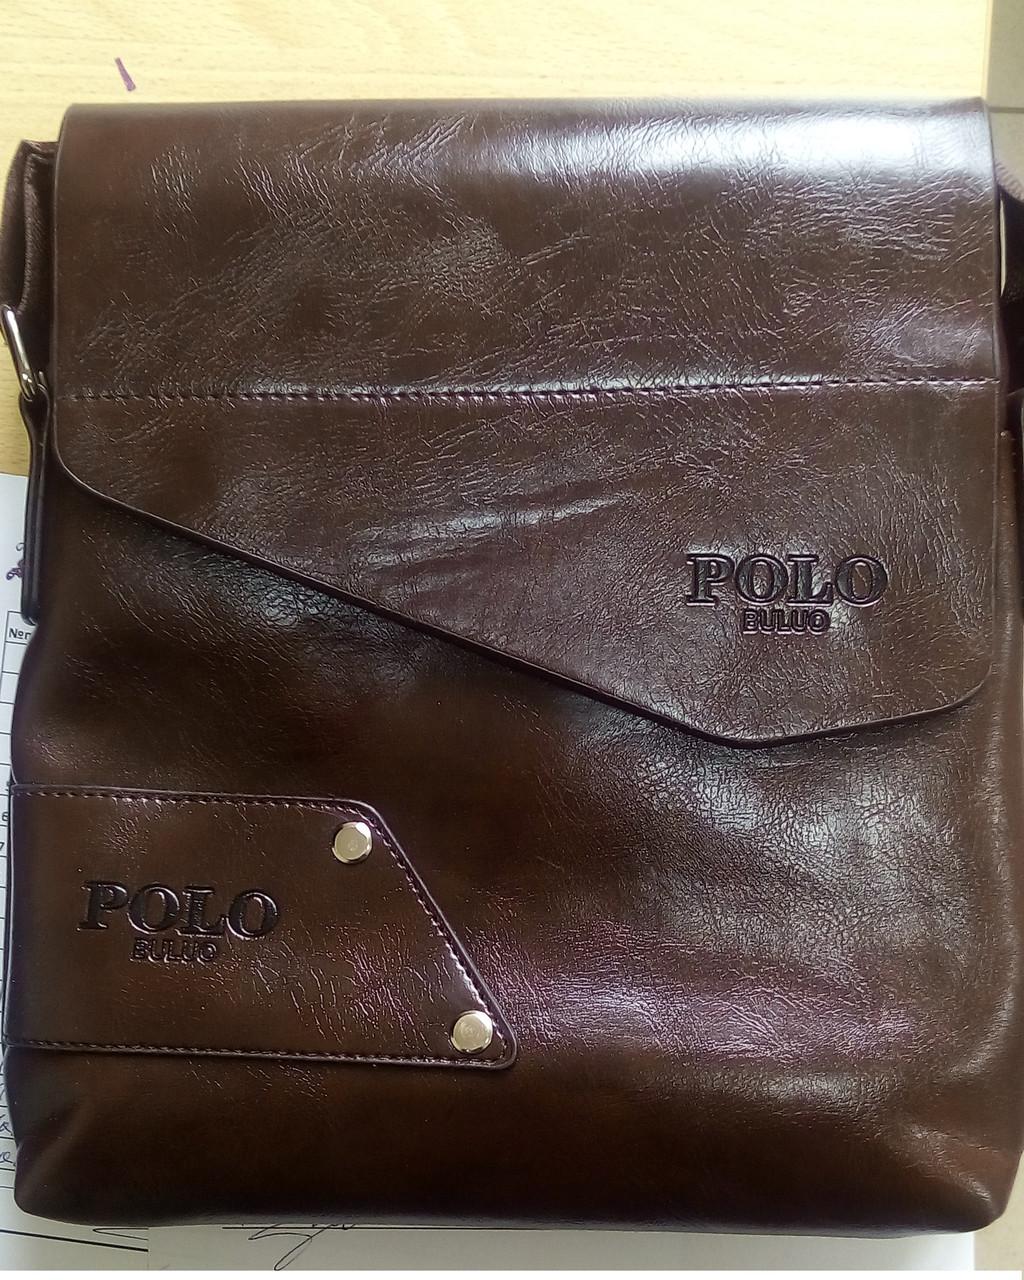 Чоловіча сумка POLO BULUO? коричнева